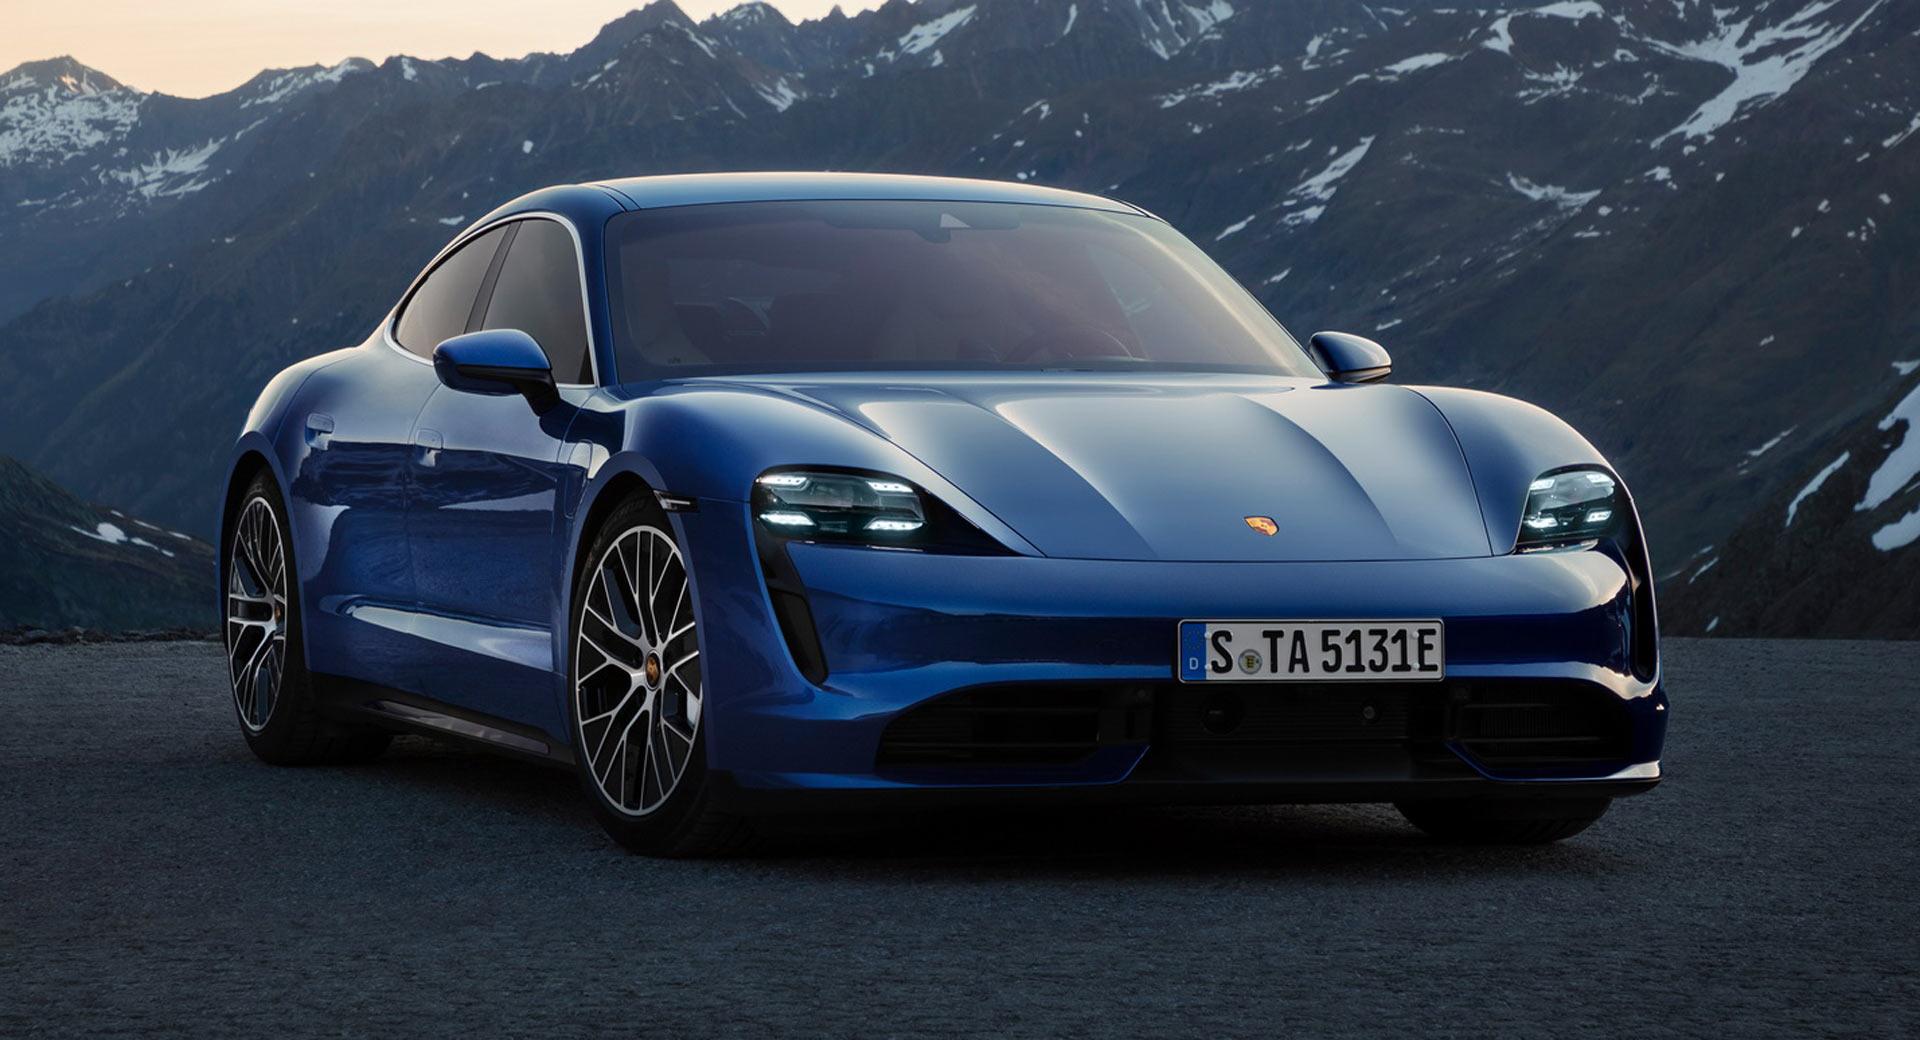 Porsche Taycan Turbo S Sets 10 47 Sec Quarter Mile Beating Tesla As Mt S Fastest Electric Car Carscoops